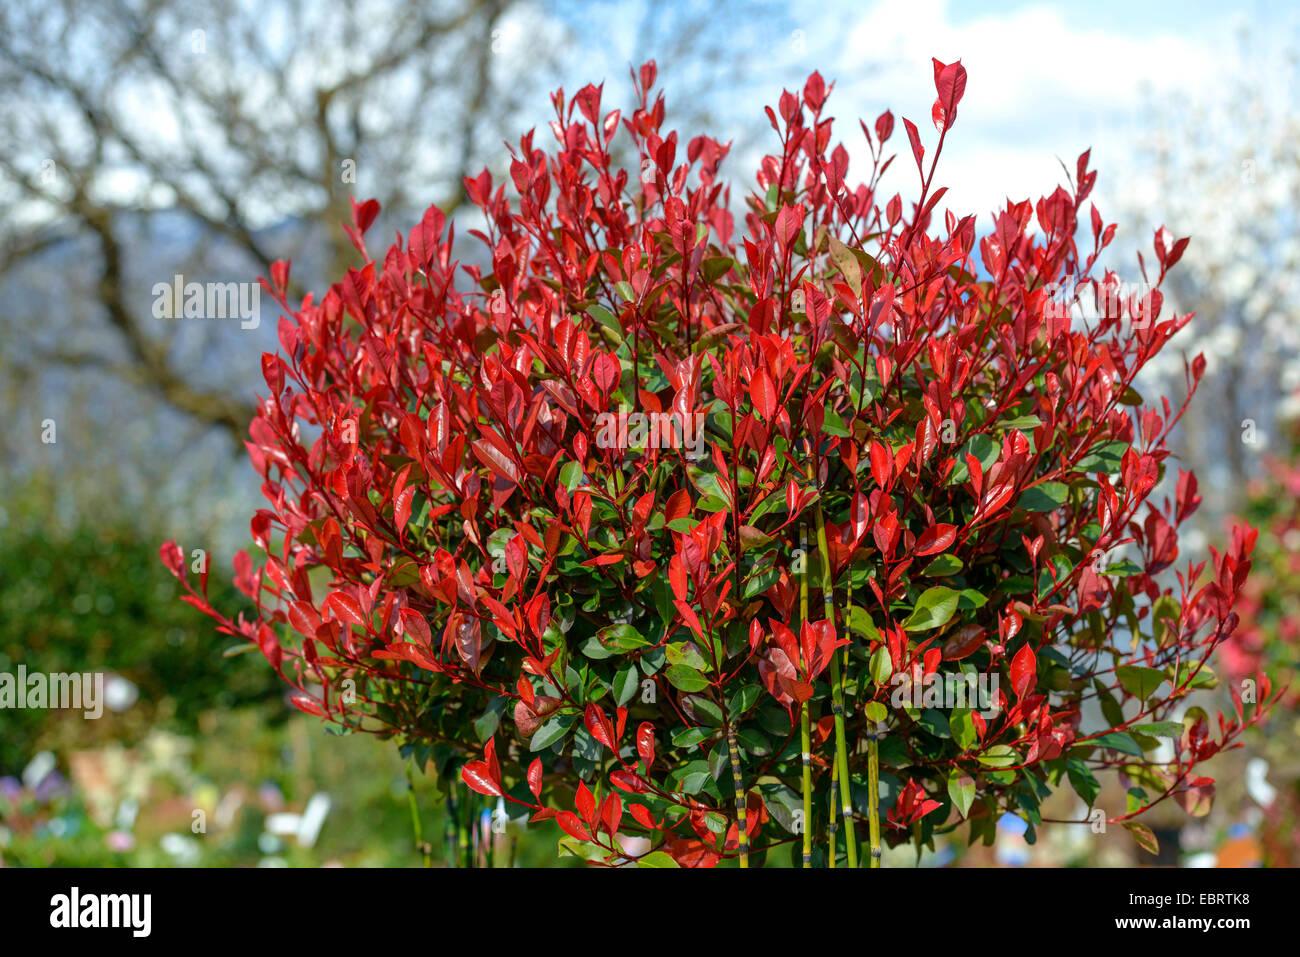 fraser photinia photinia x fraseri 39 little red robin. Black Bedroom Furniture Sets. Home Design Ideas